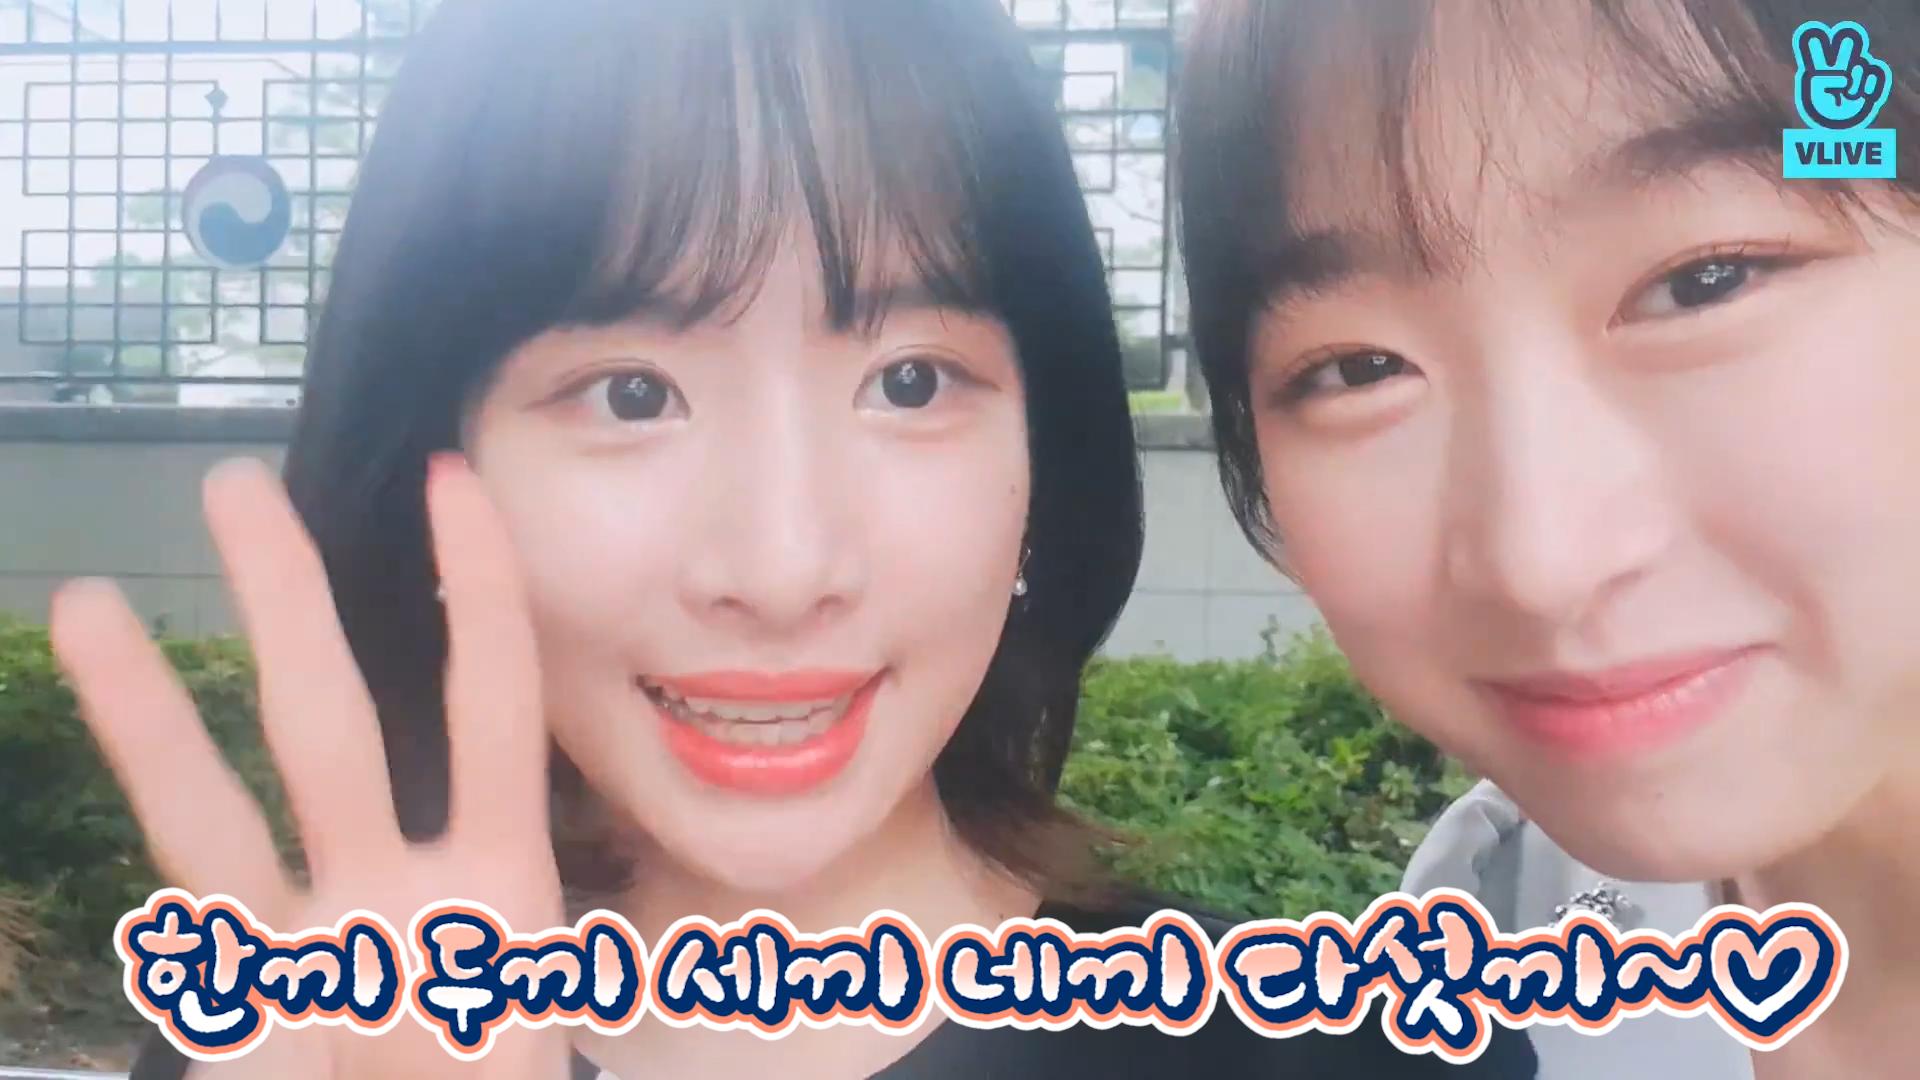 [WJSN] 떨뚜와 함께라면 쑥마늘로 삼시한끼두끼귀여운세끼네끼다섯끼 가능!!(๑❛ڡ❛๑)💖 (SEOLA&SOOBIN talking about their duet)